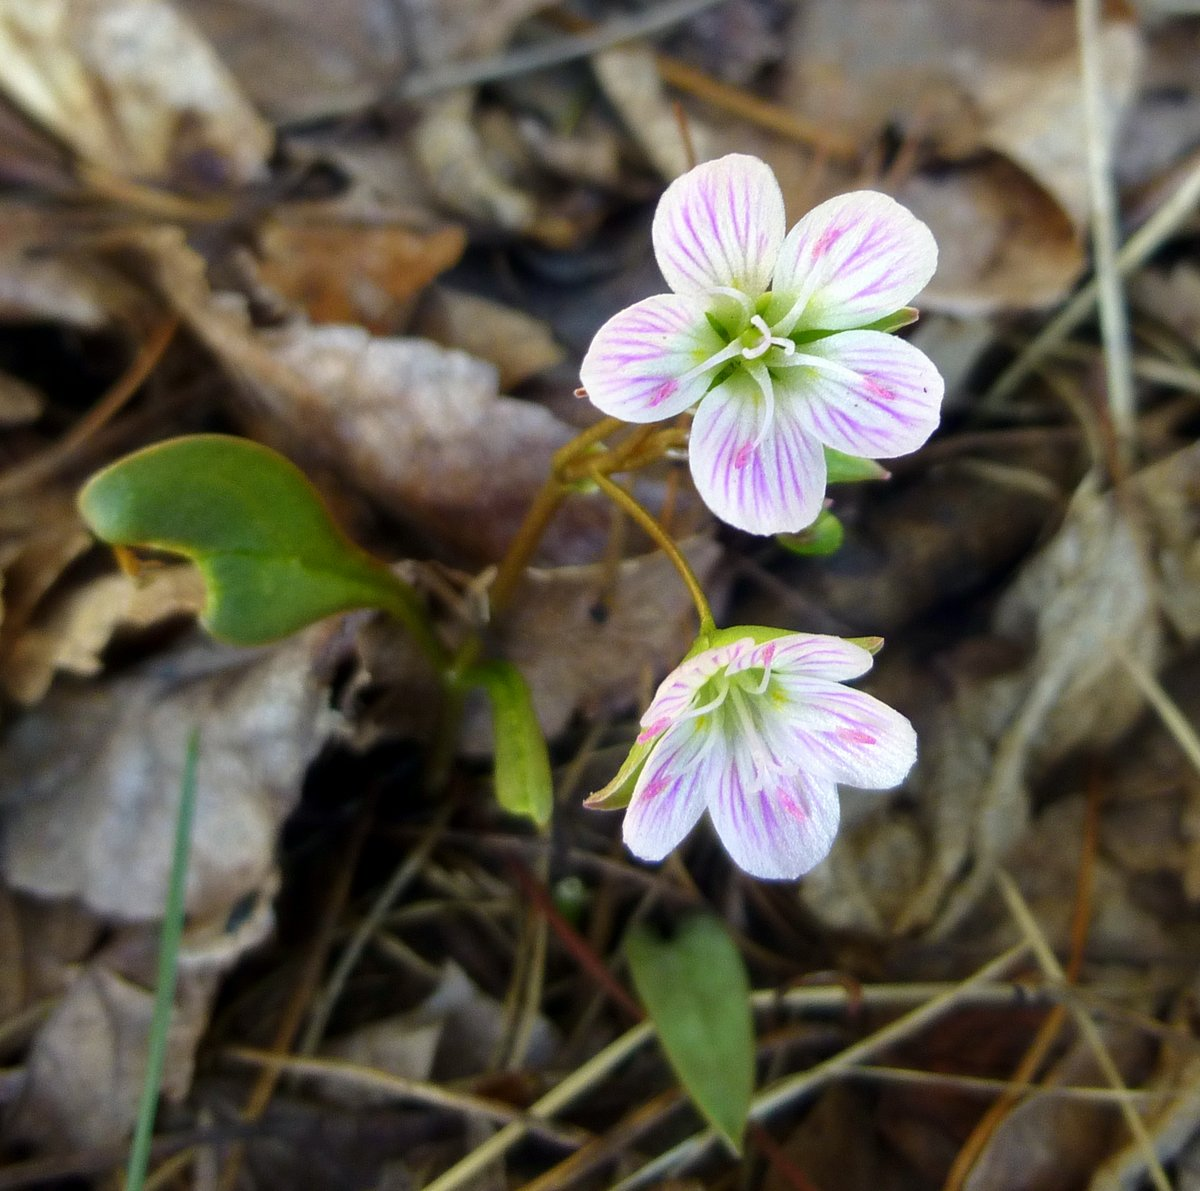 7. Spring Beauties